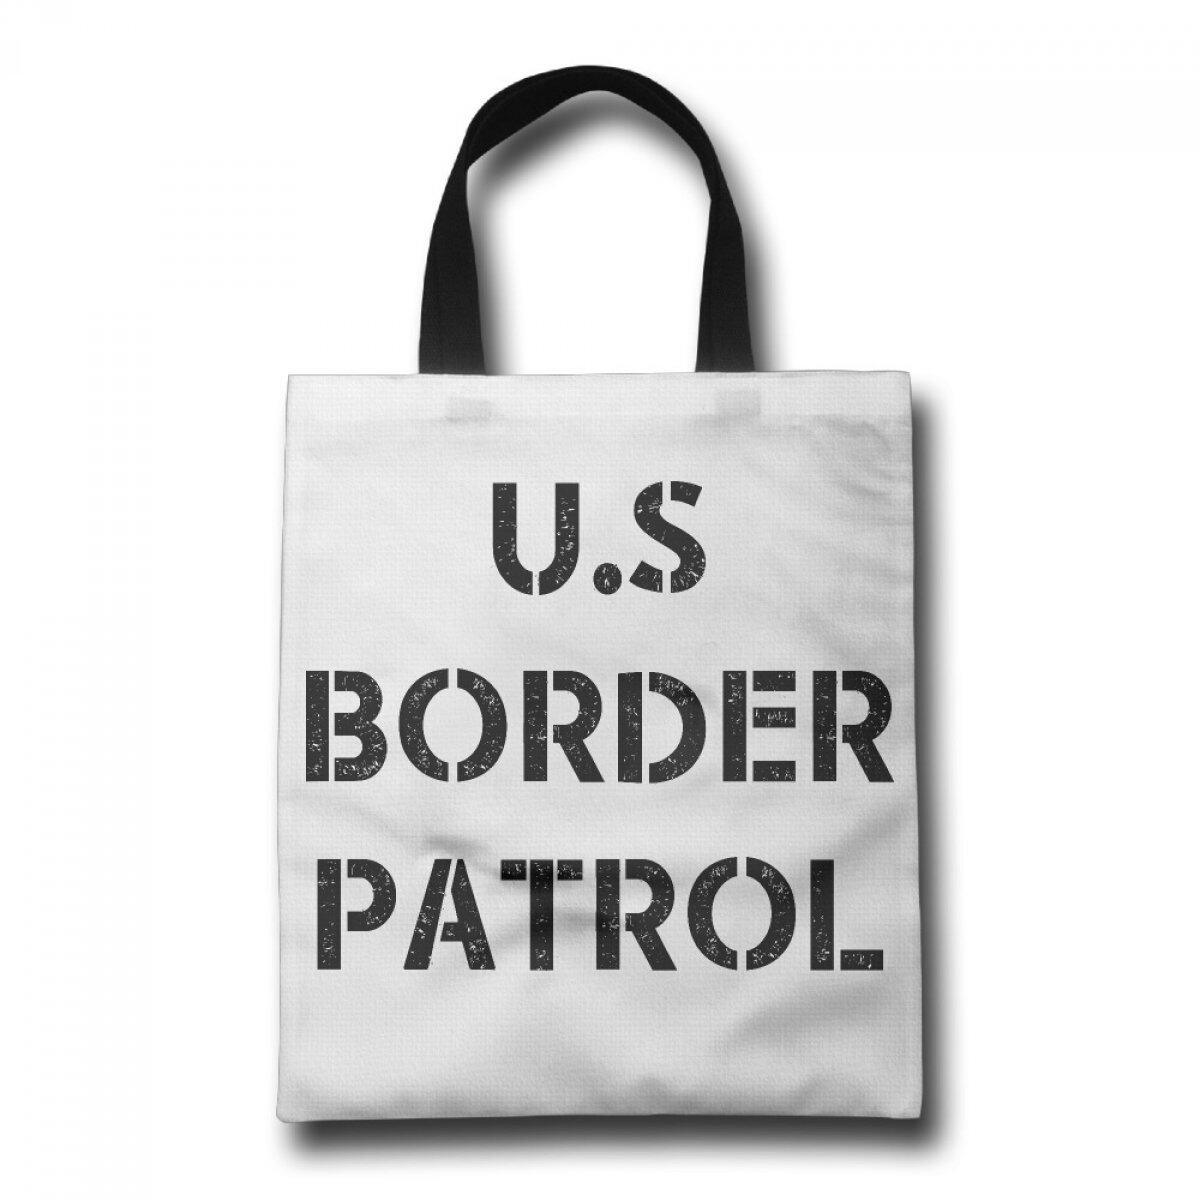 PhoRock Women Build The Wall  Border Patrol Printed Canvas Tote Bag GWRC003 0